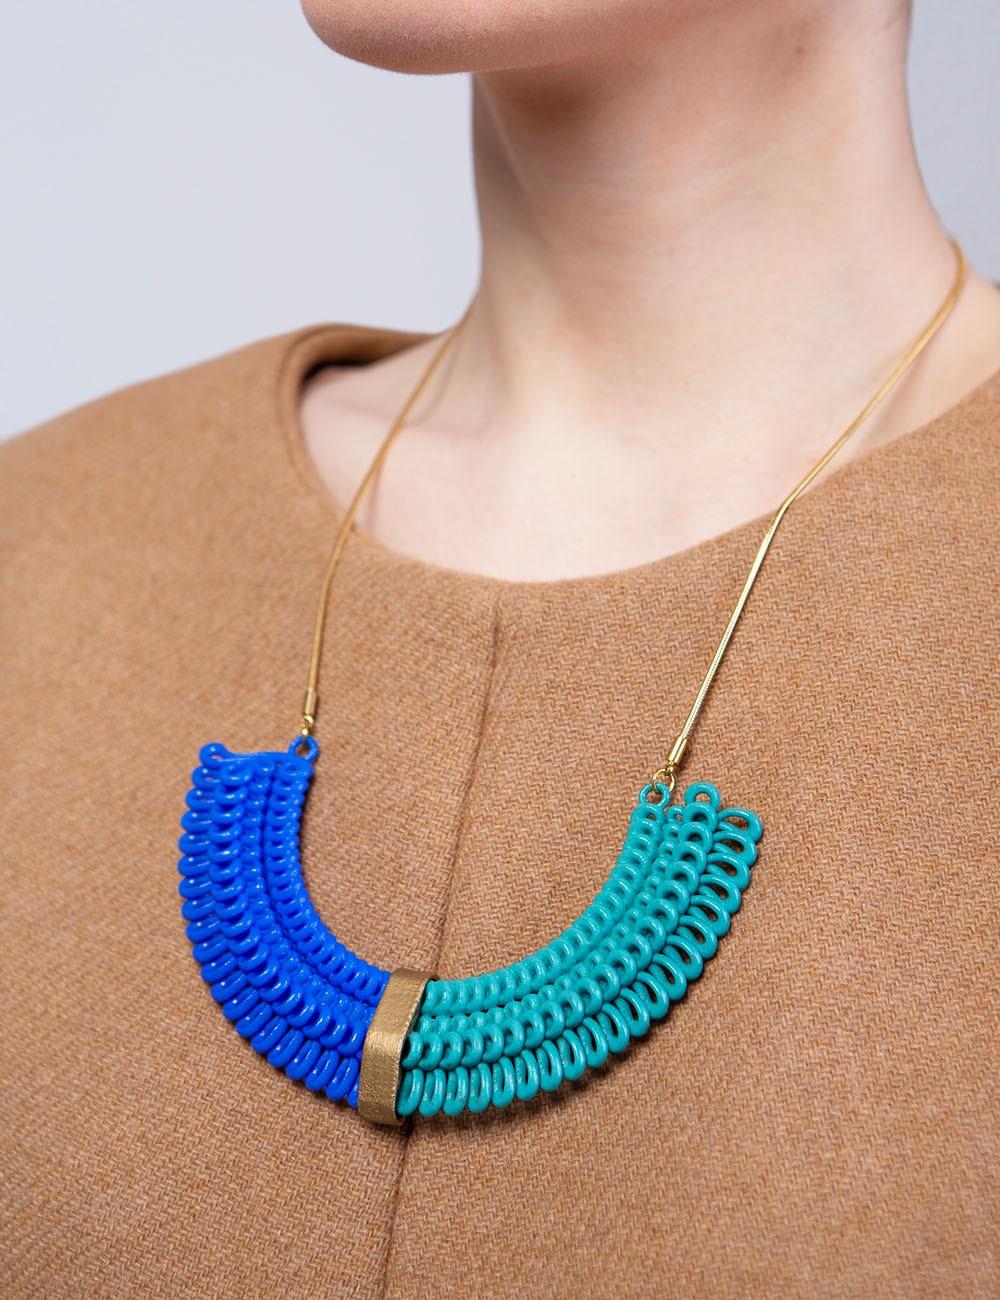 Teneriffe II necklace NK-23B BLUE and ANIMA Paolin custom jewels